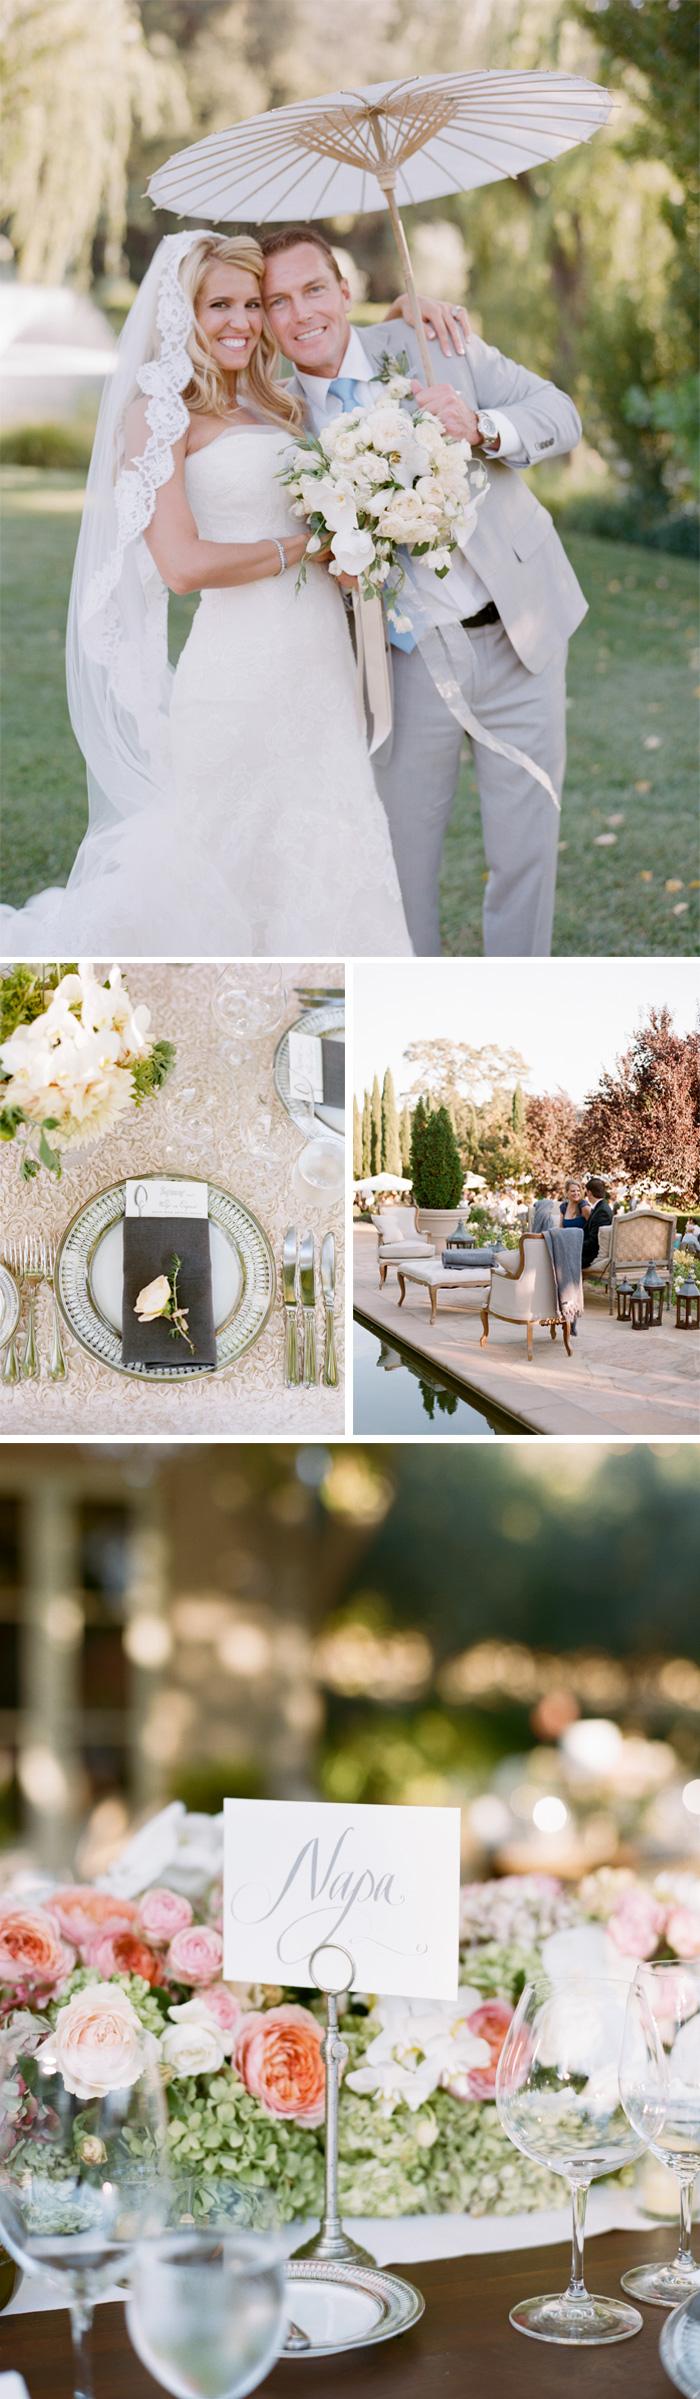 SylvieGIl-Film-Wedding-Photography-Black-Swan-Lake-Napa-Sonoma-California-Flowers-Table-Pool-reception-Place-Setting